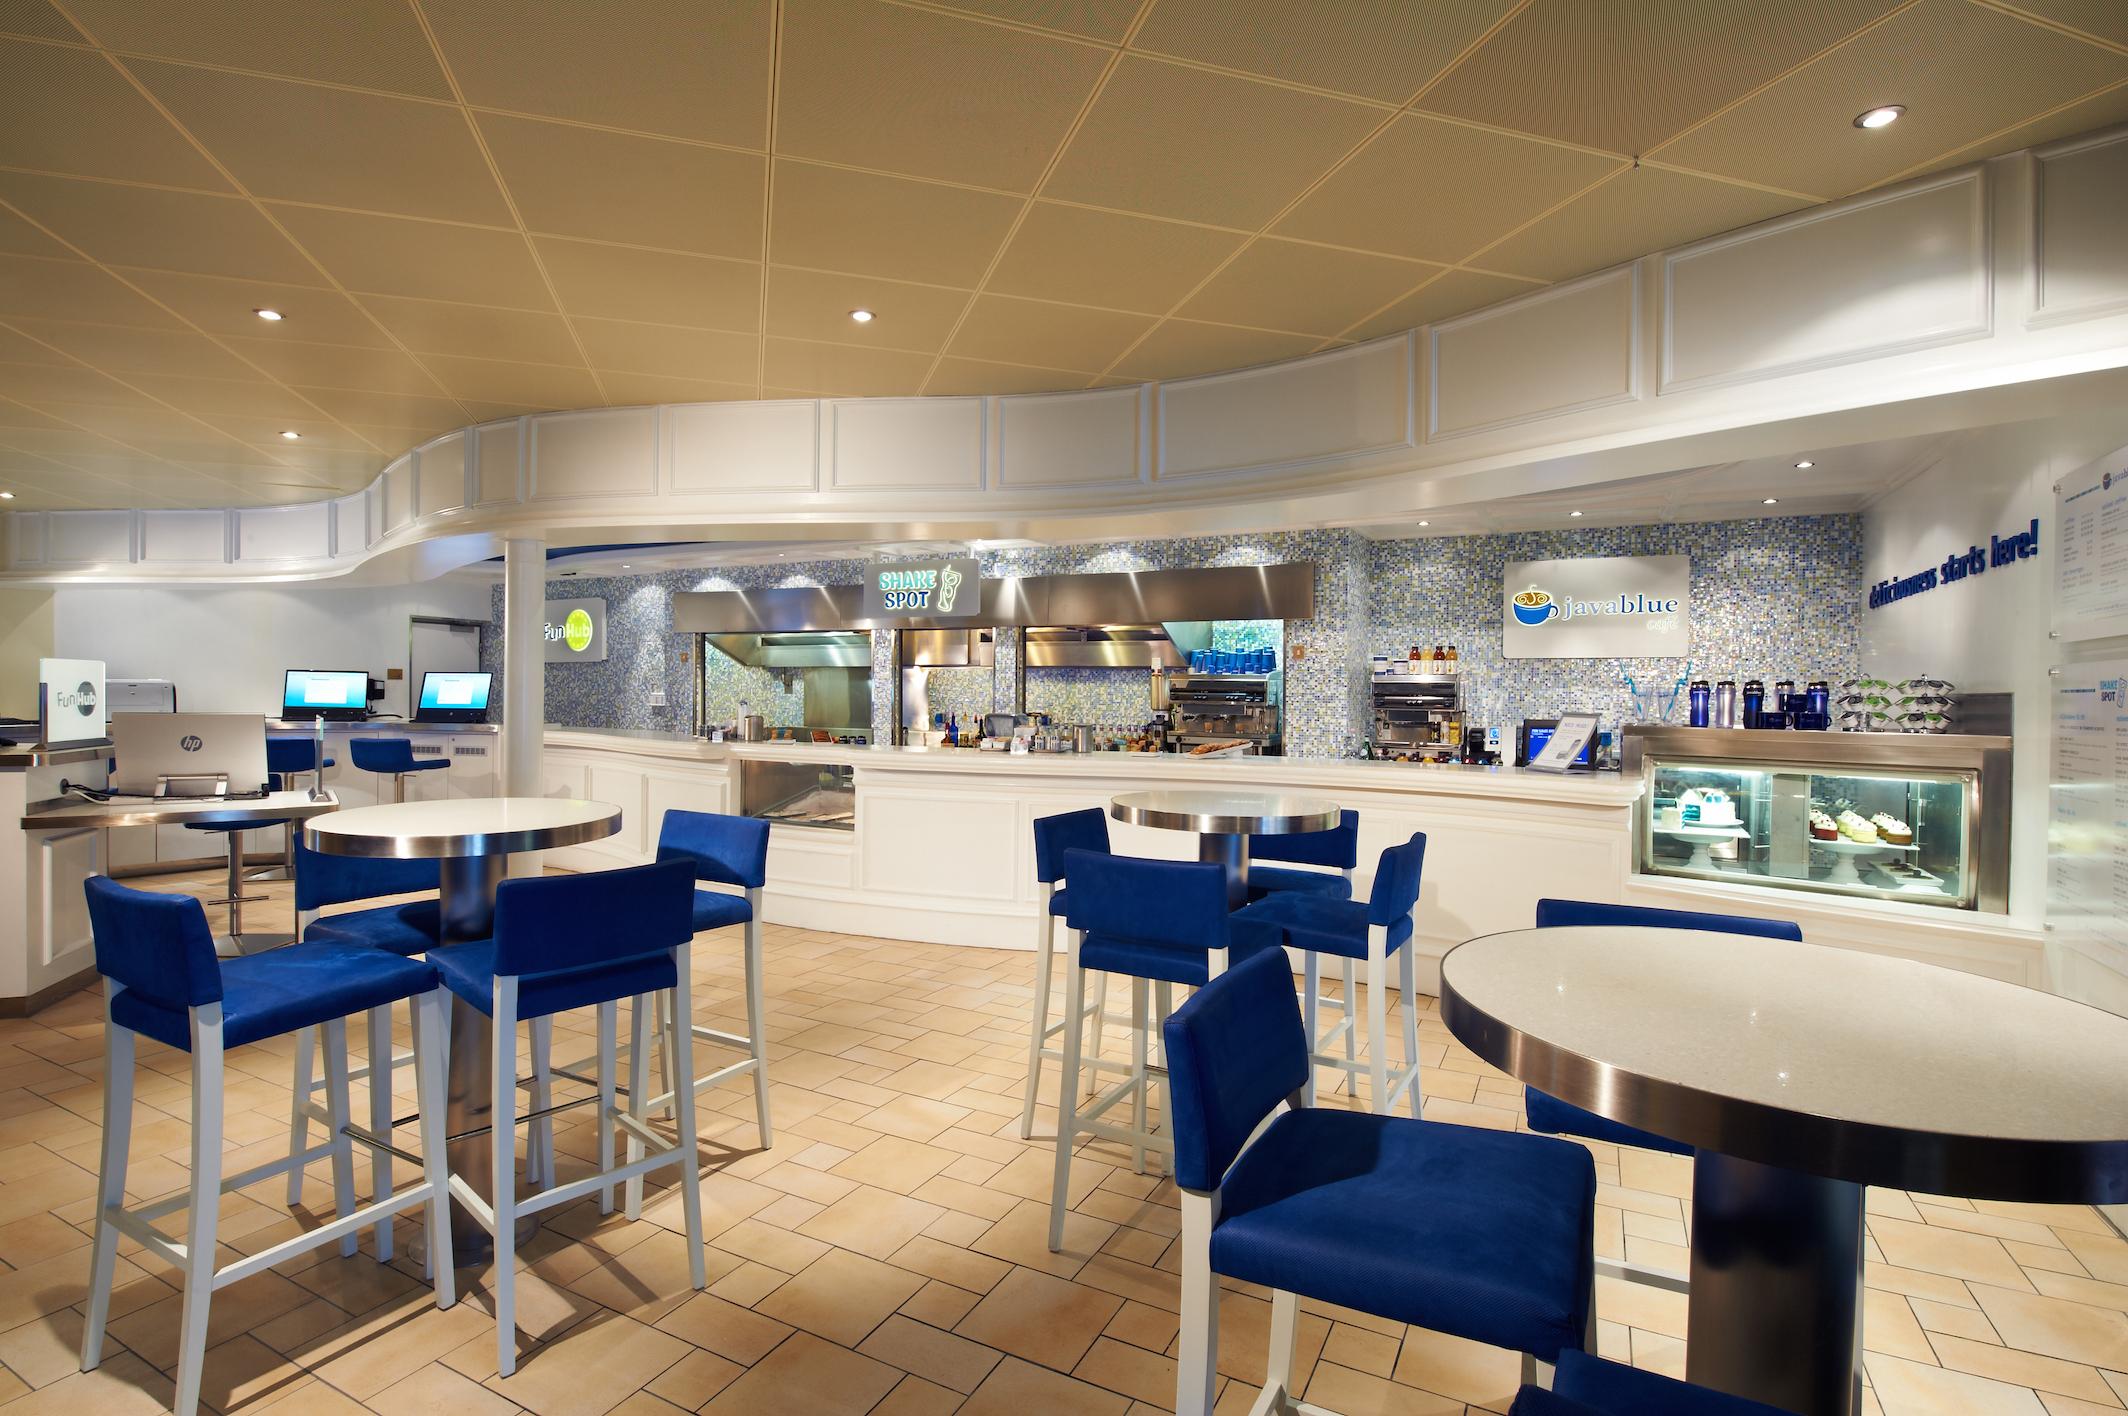 Carnival Cruise Lines Carnival Sunshine Java Blue Cafe 1.jpg